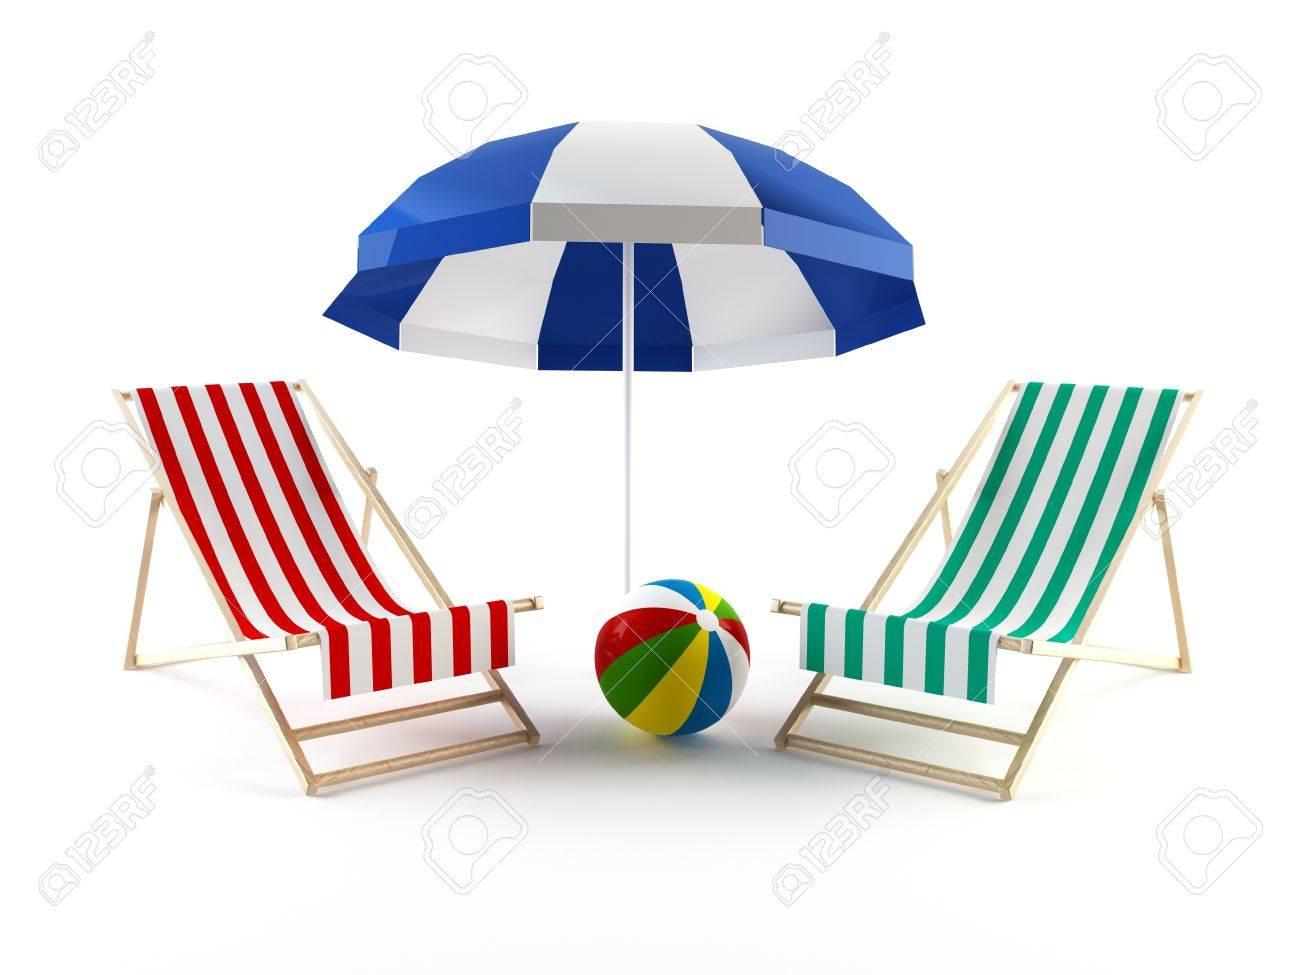 Beach chairs with umbrella - Beach Chairs And Ball Under An Umbrella Stock Photo 13432021